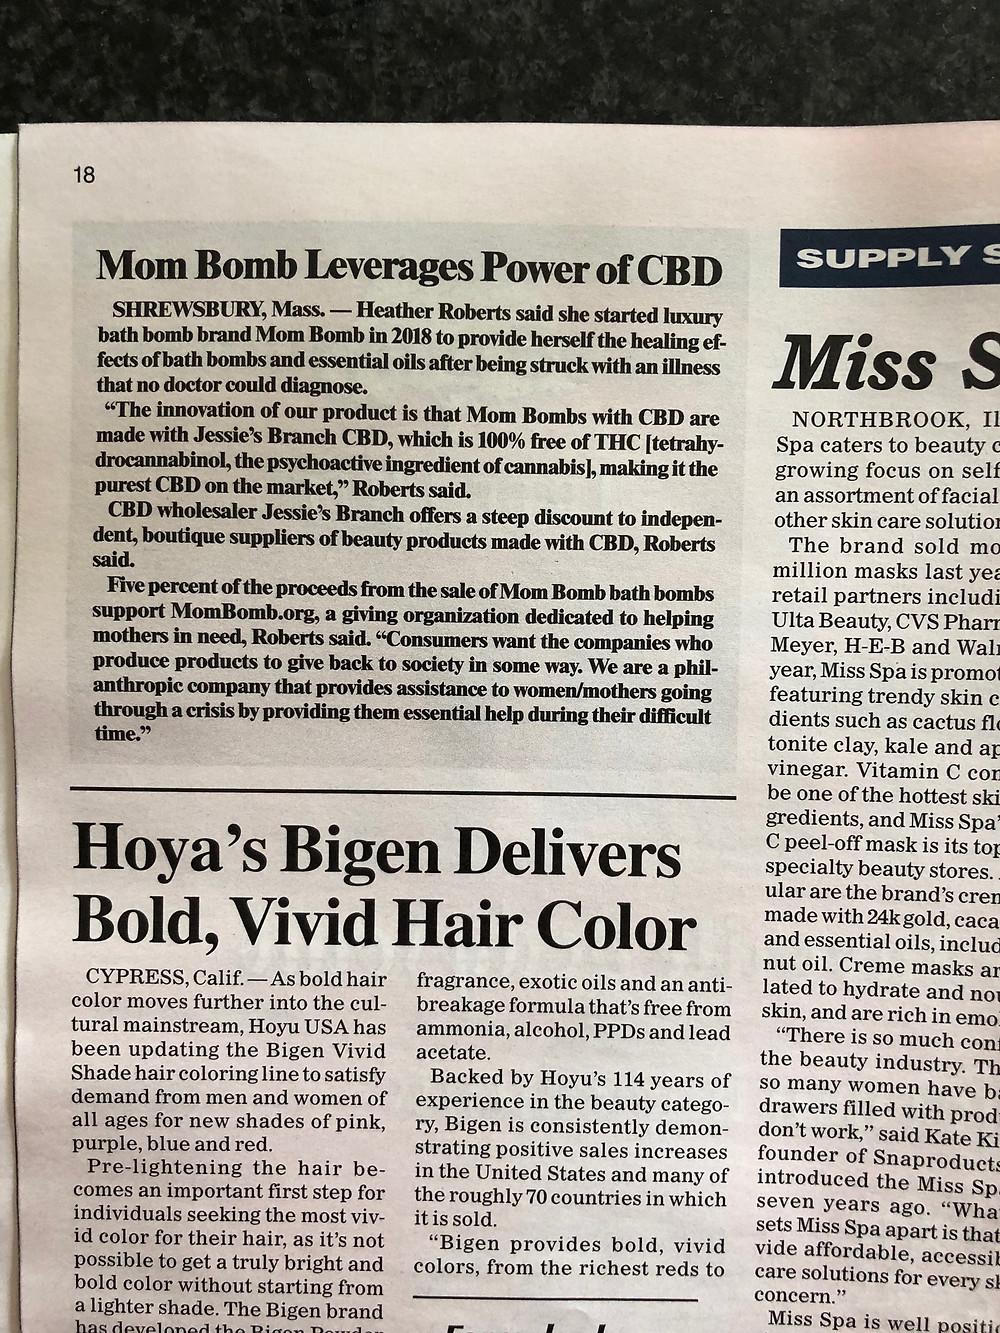 MMR Mass Market Realtors CBD Beauty Edition - Women Are Leading